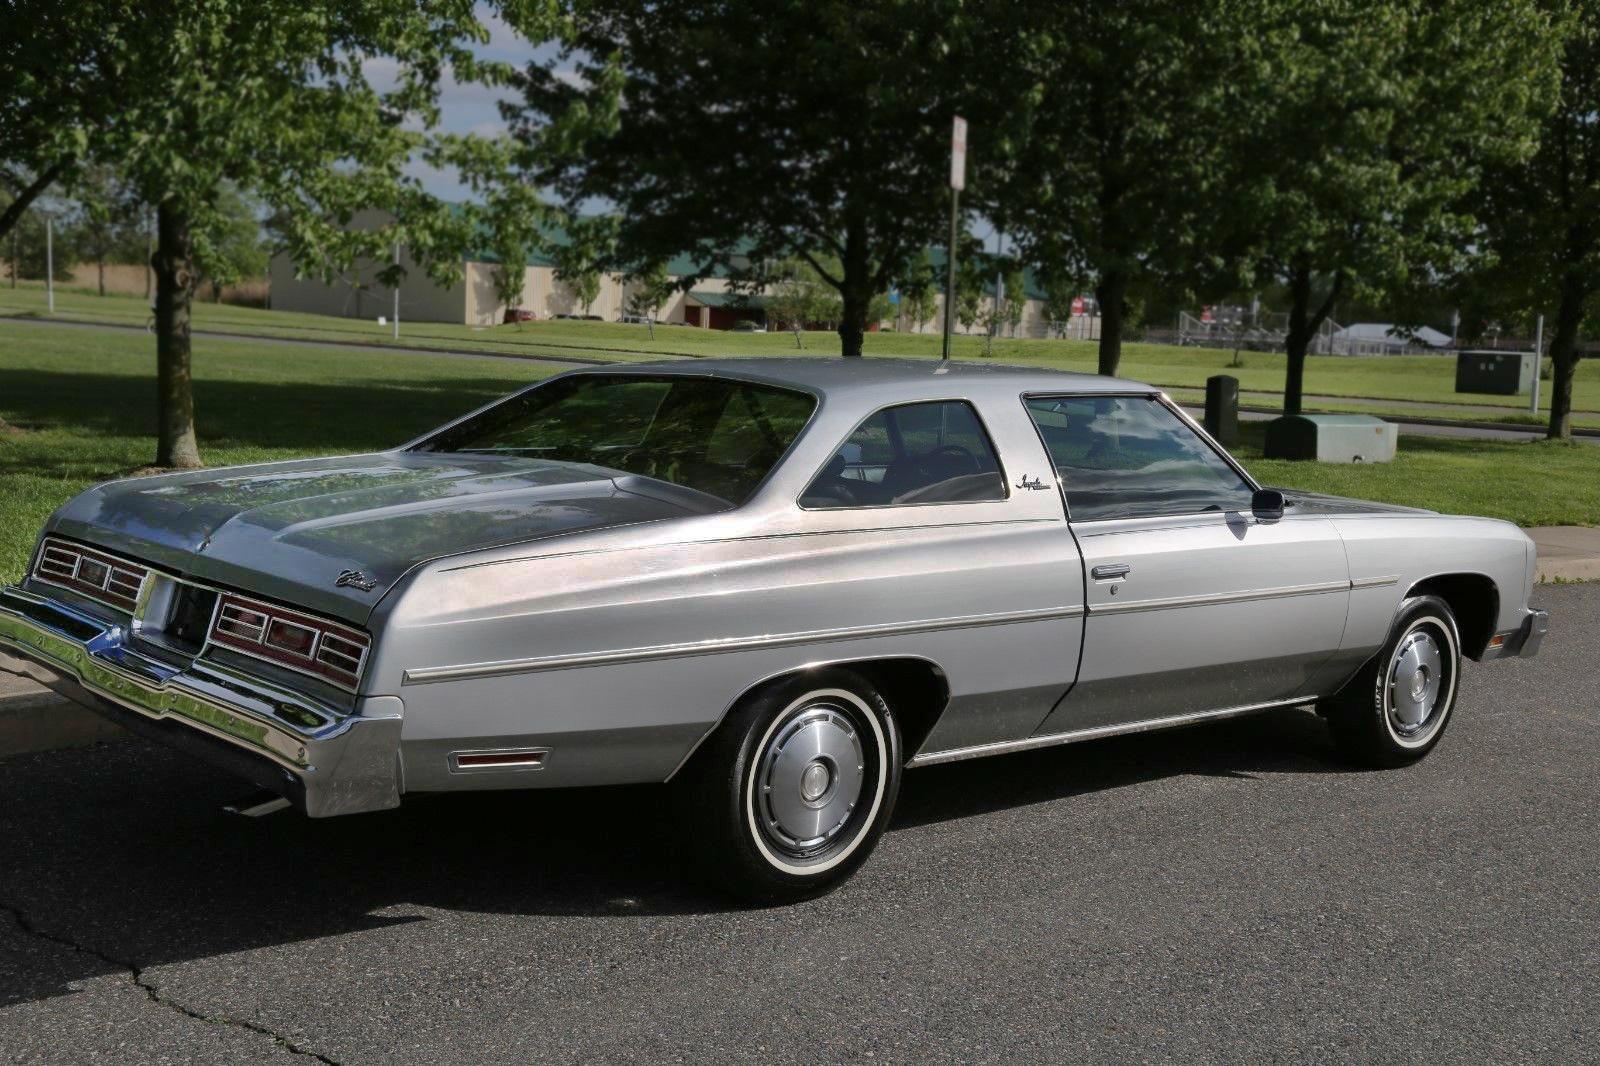 Used 2014 Chevy Impala >> 14,534 Miles! 1976 Chevrolet Impala